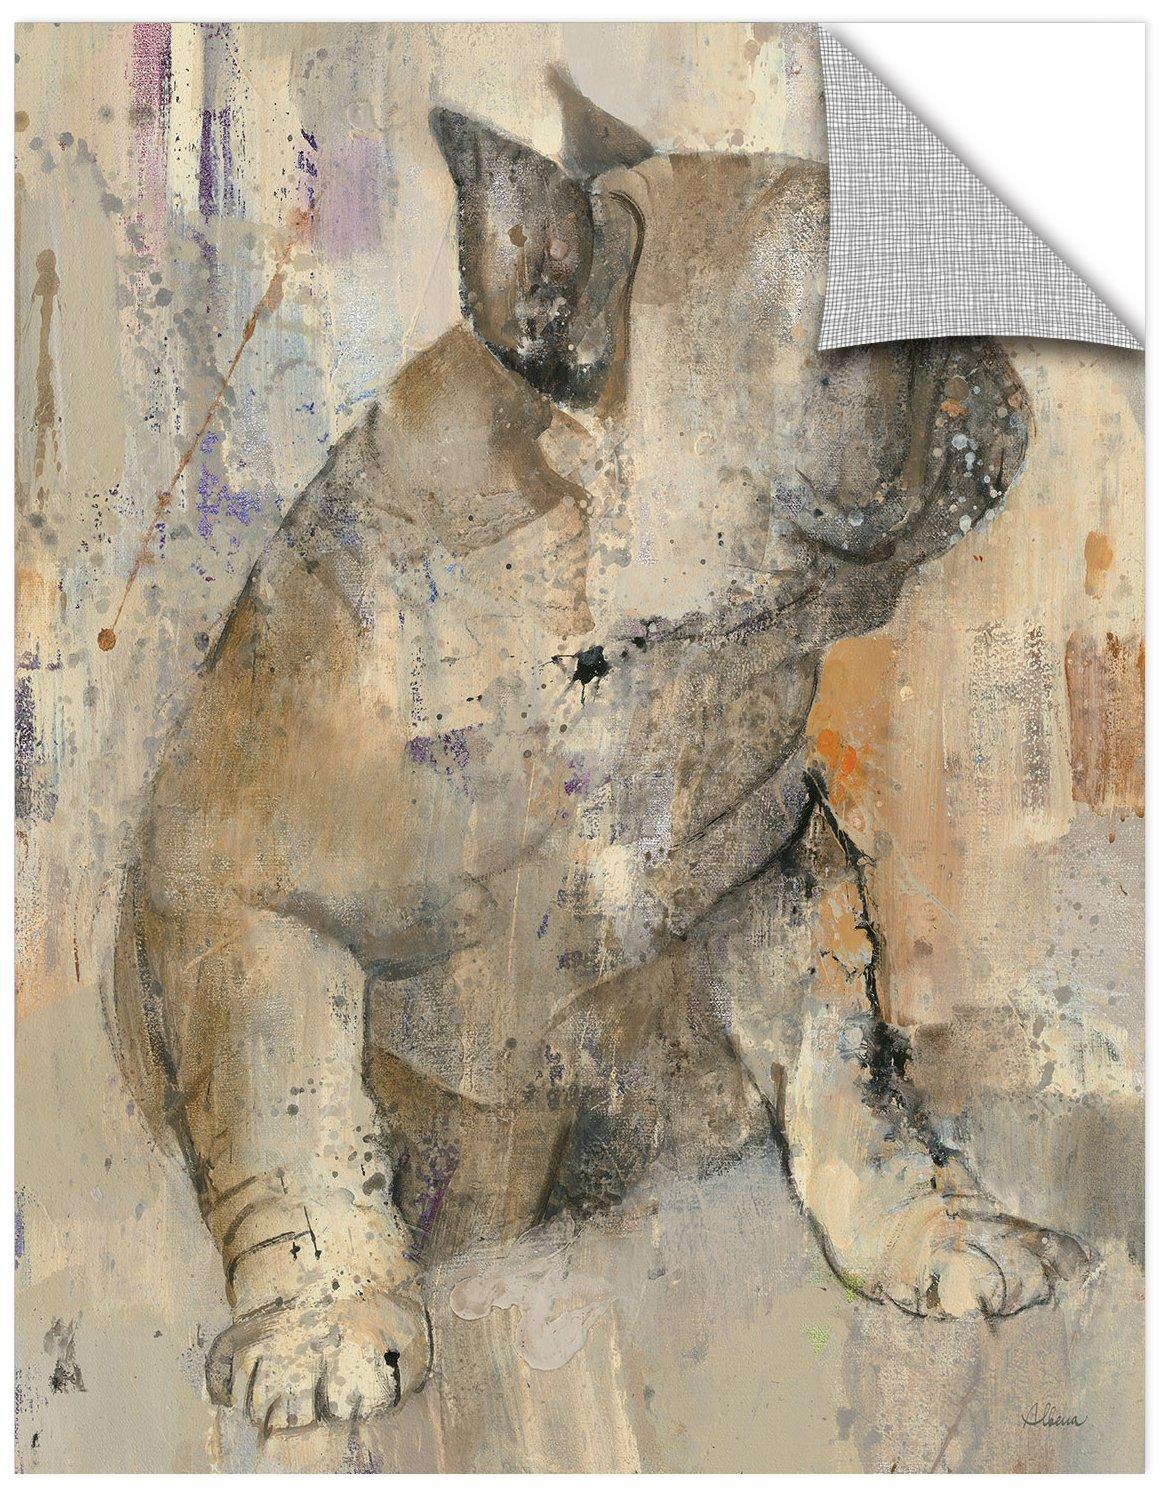 18X24 Albena Hristova Duke Removable Wall Art Mural